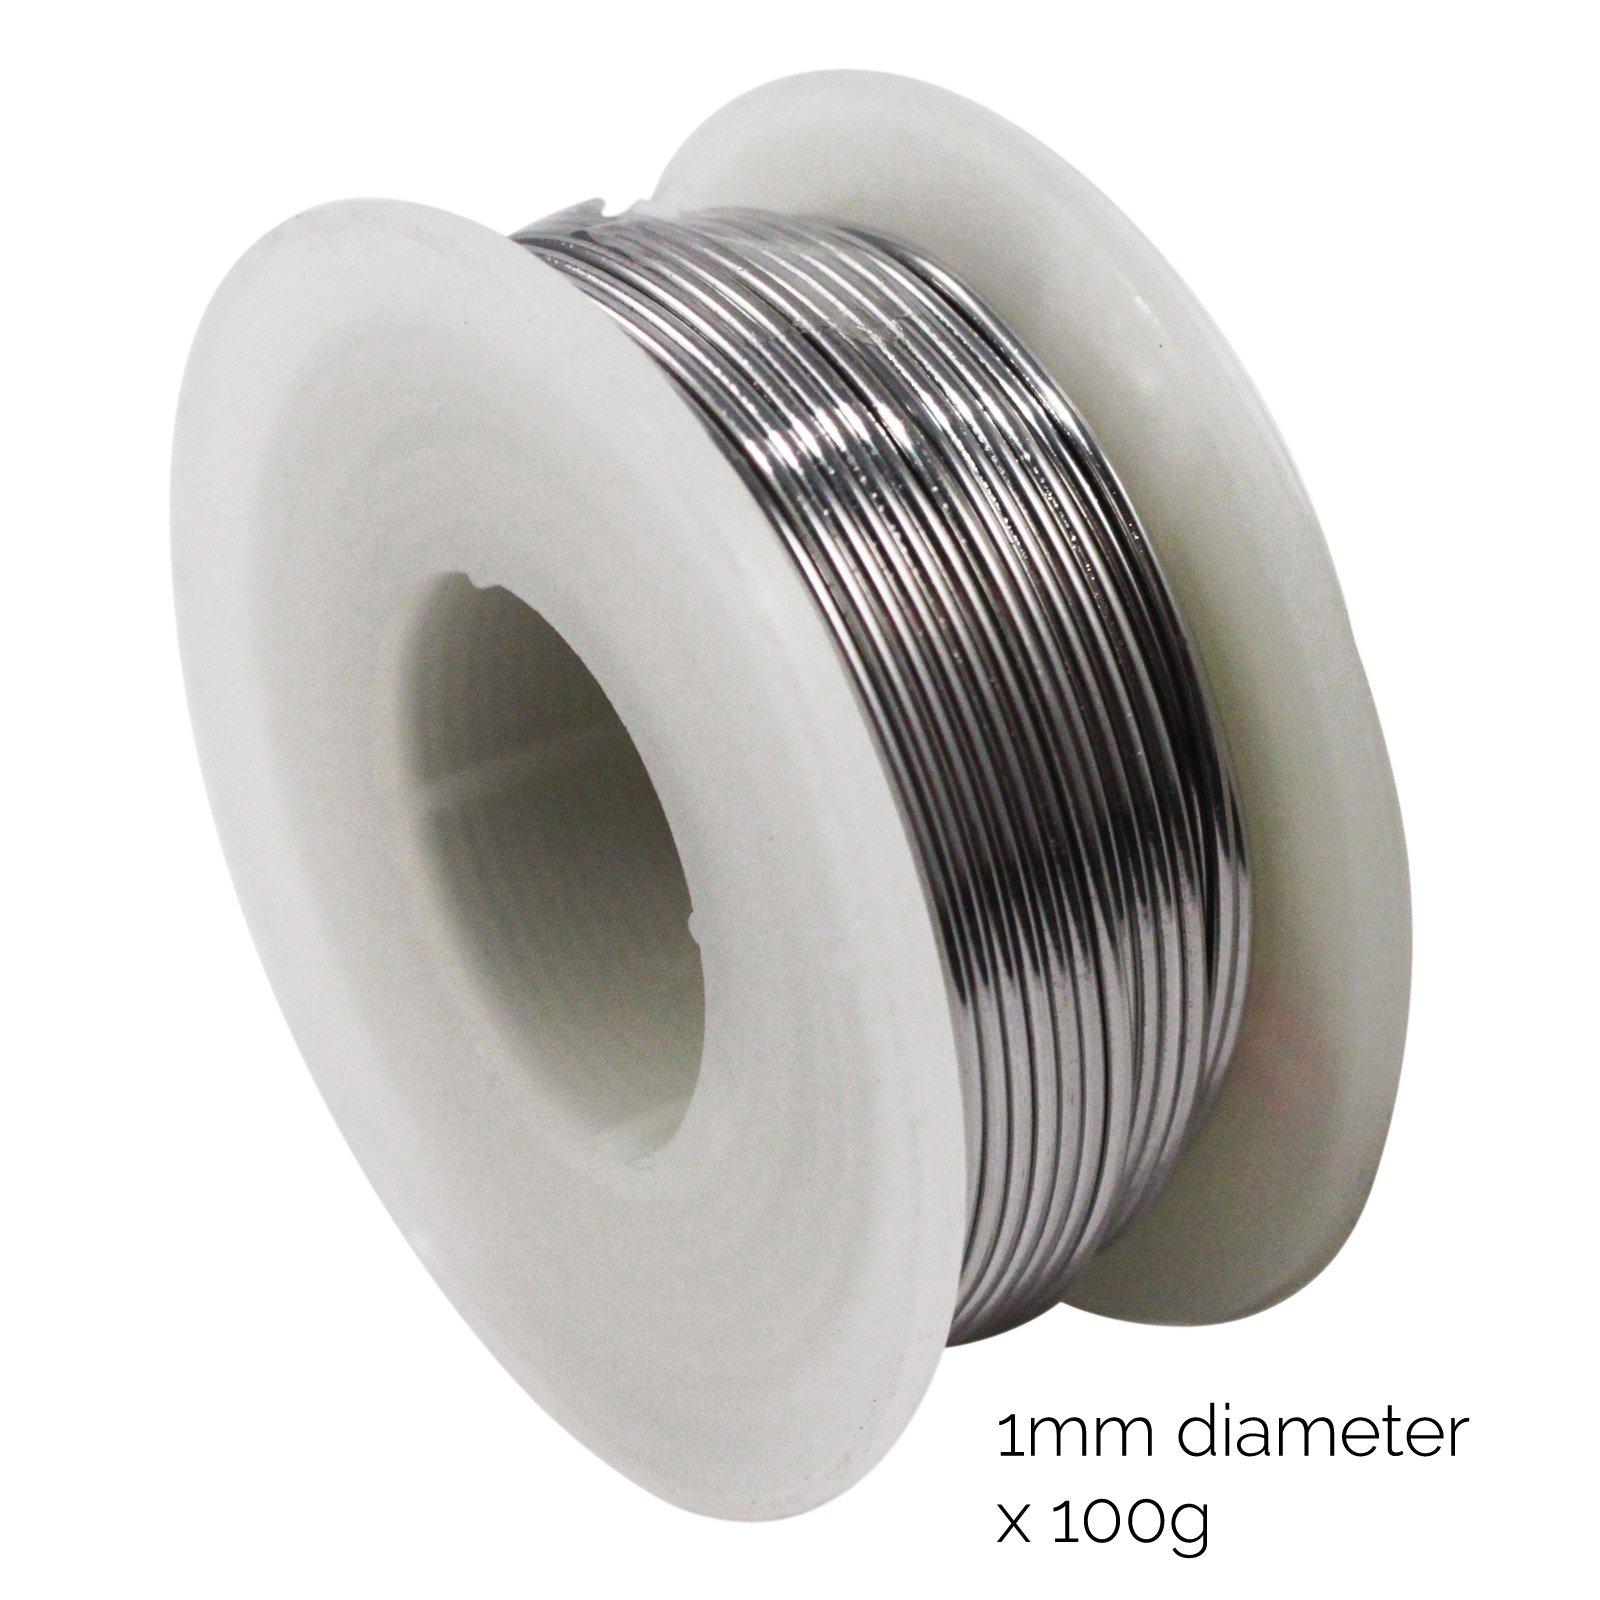 Universal Tool Reeled Solder with Flux Coating 100 Grams 1mm Diameter